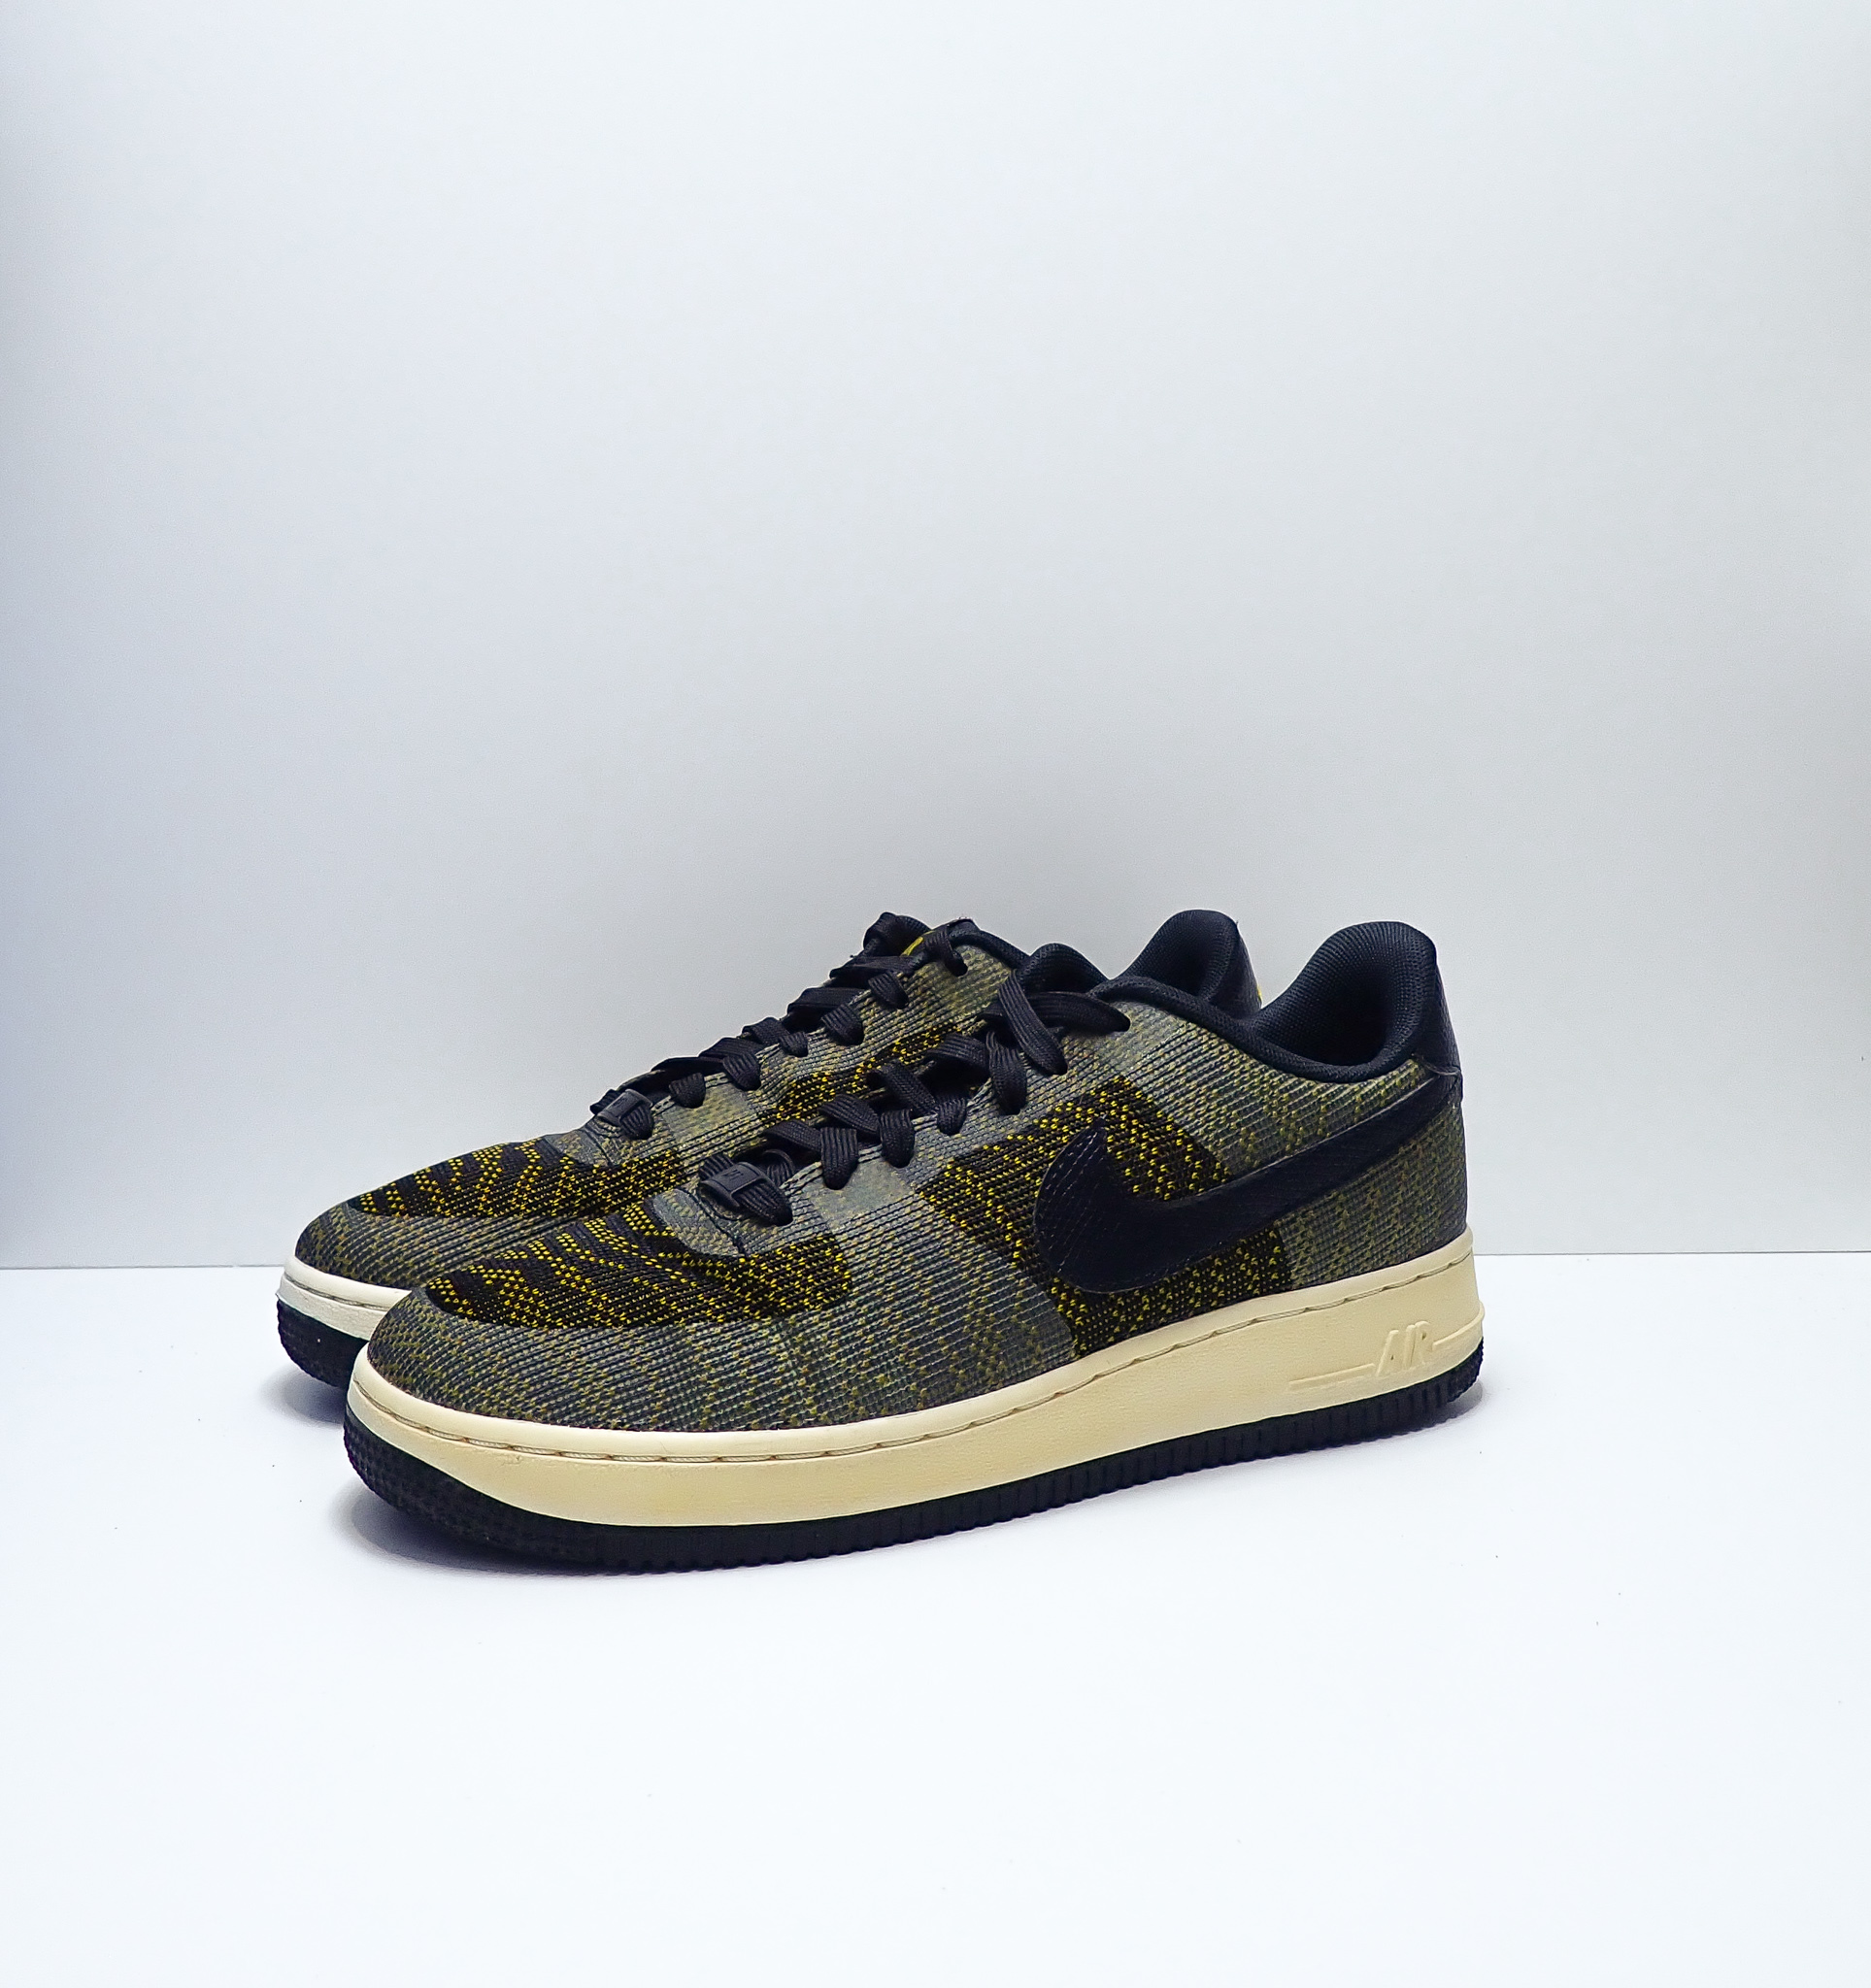 Nike W Air Force 1 07 Knit Jacquard